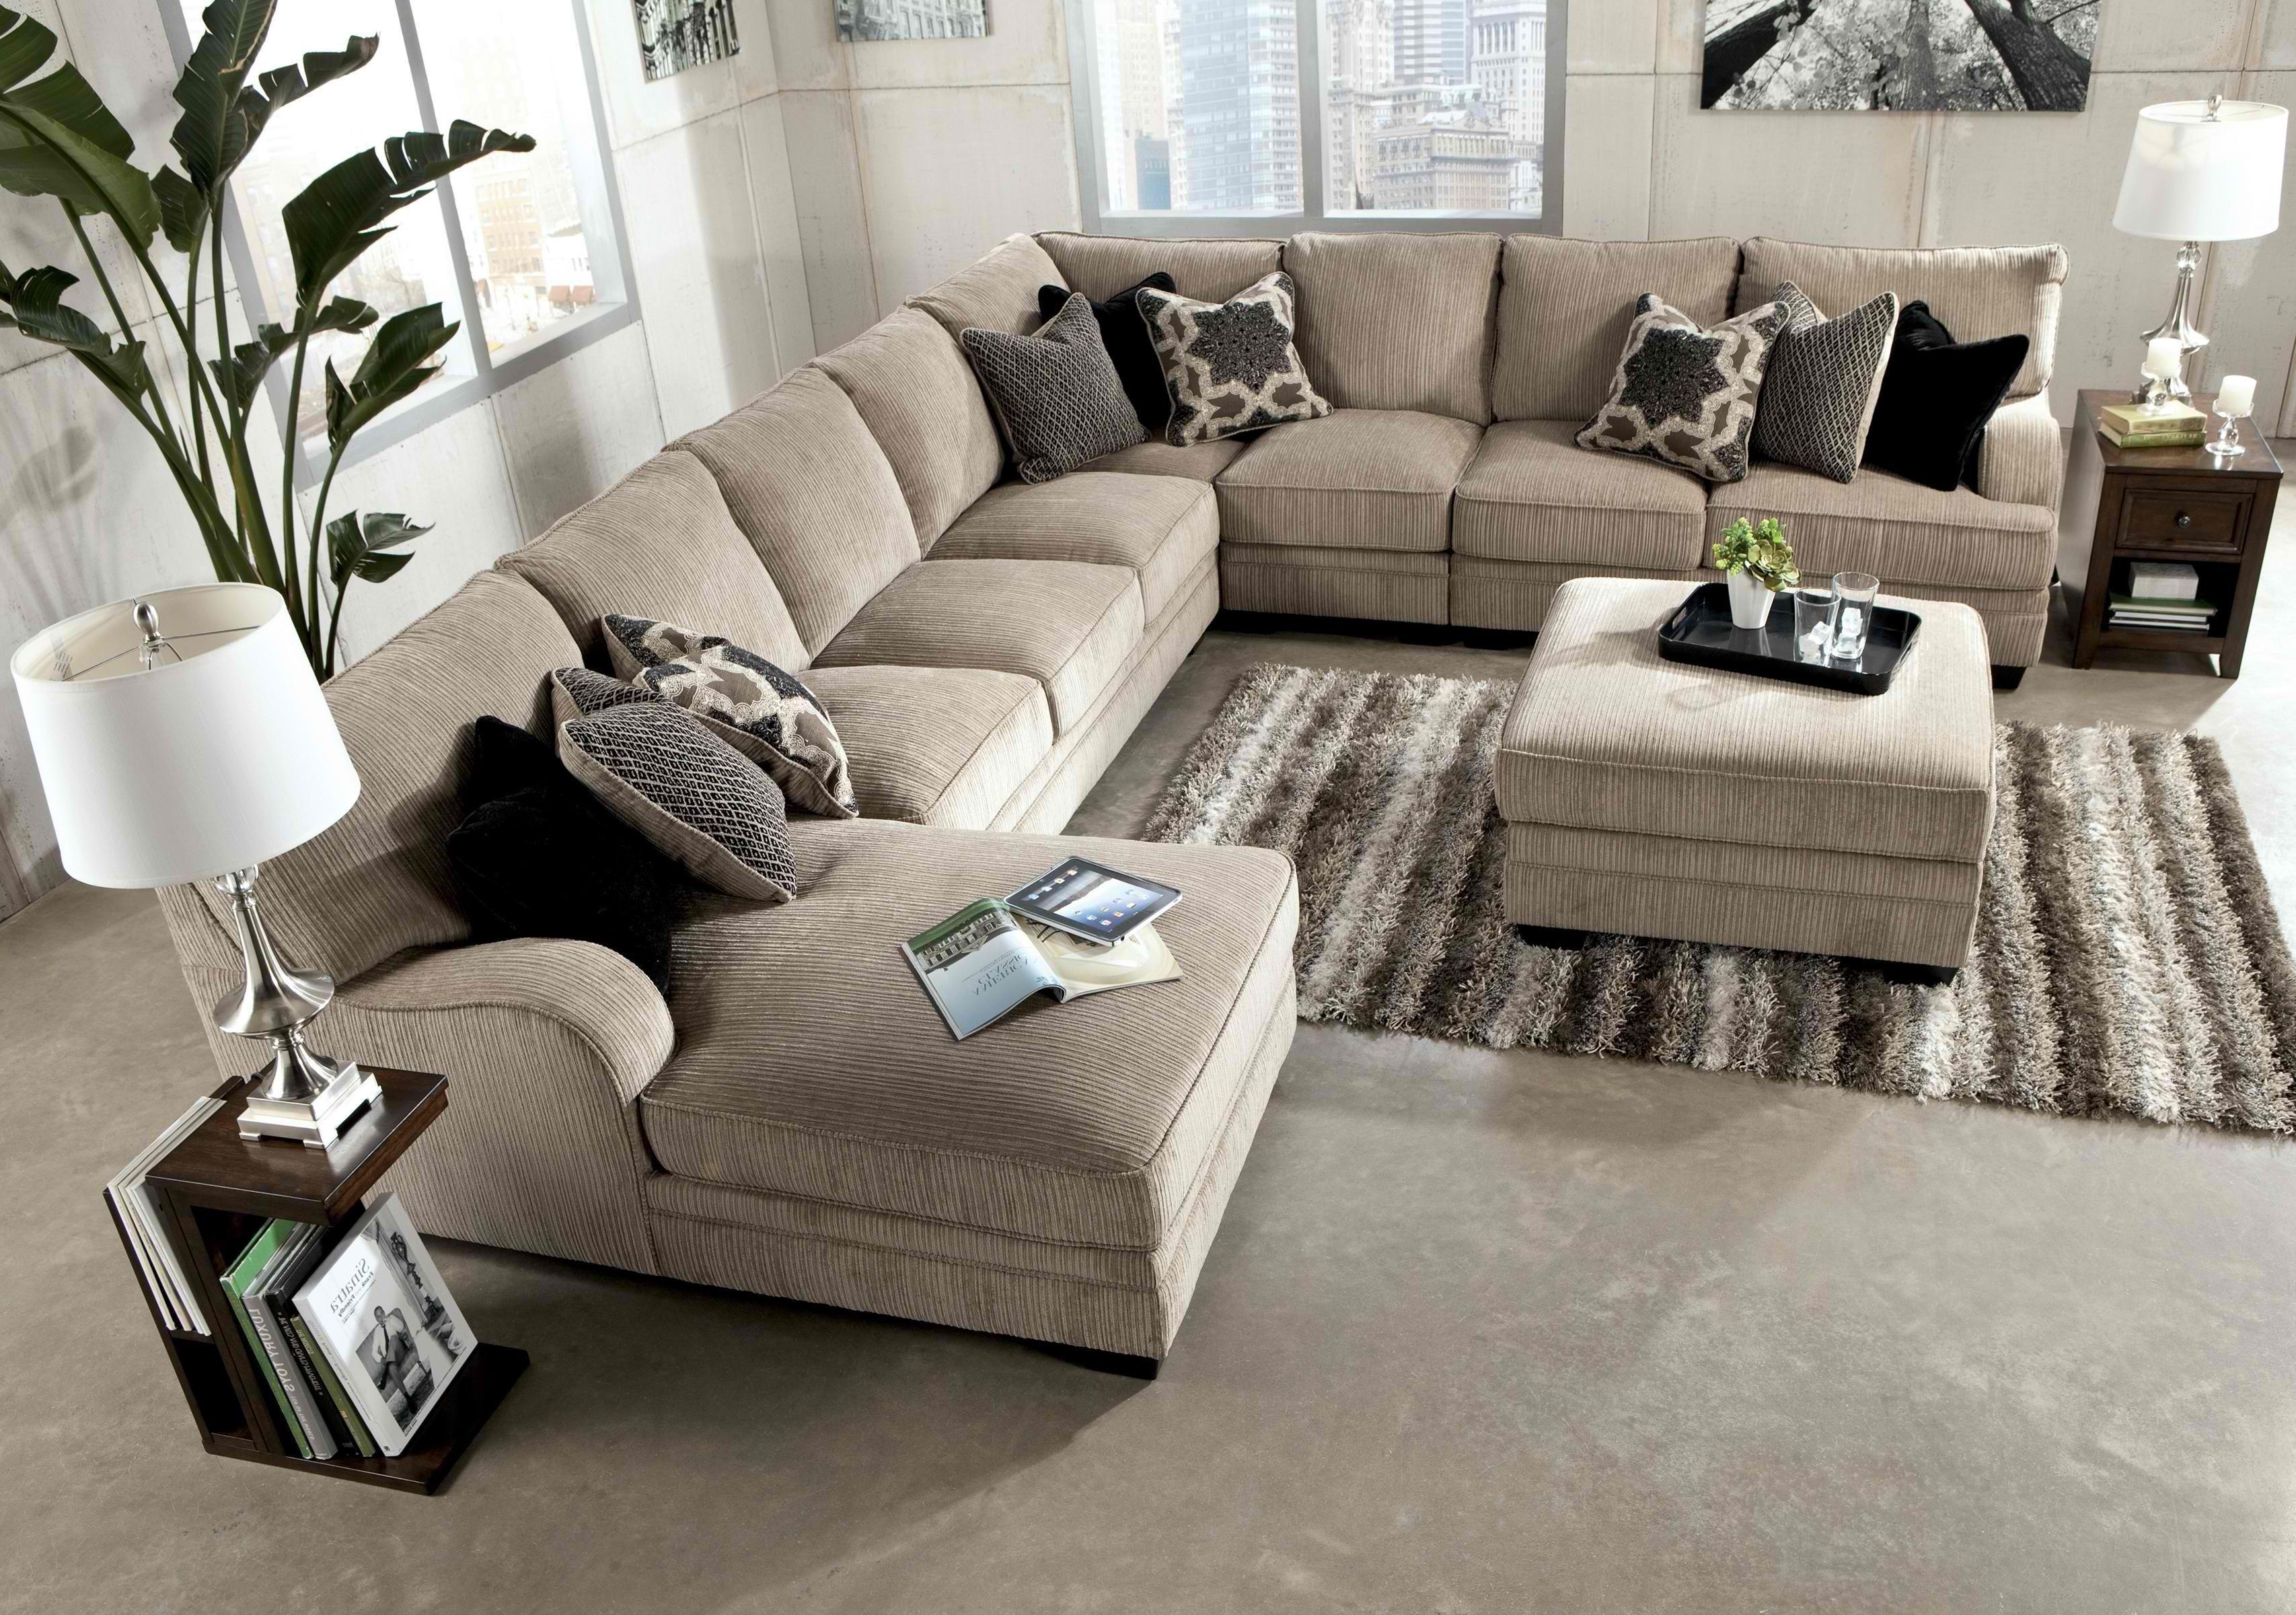 Best 15 Luxury 5 Piece Fabric Sectional Interior Design Design 400 x 300